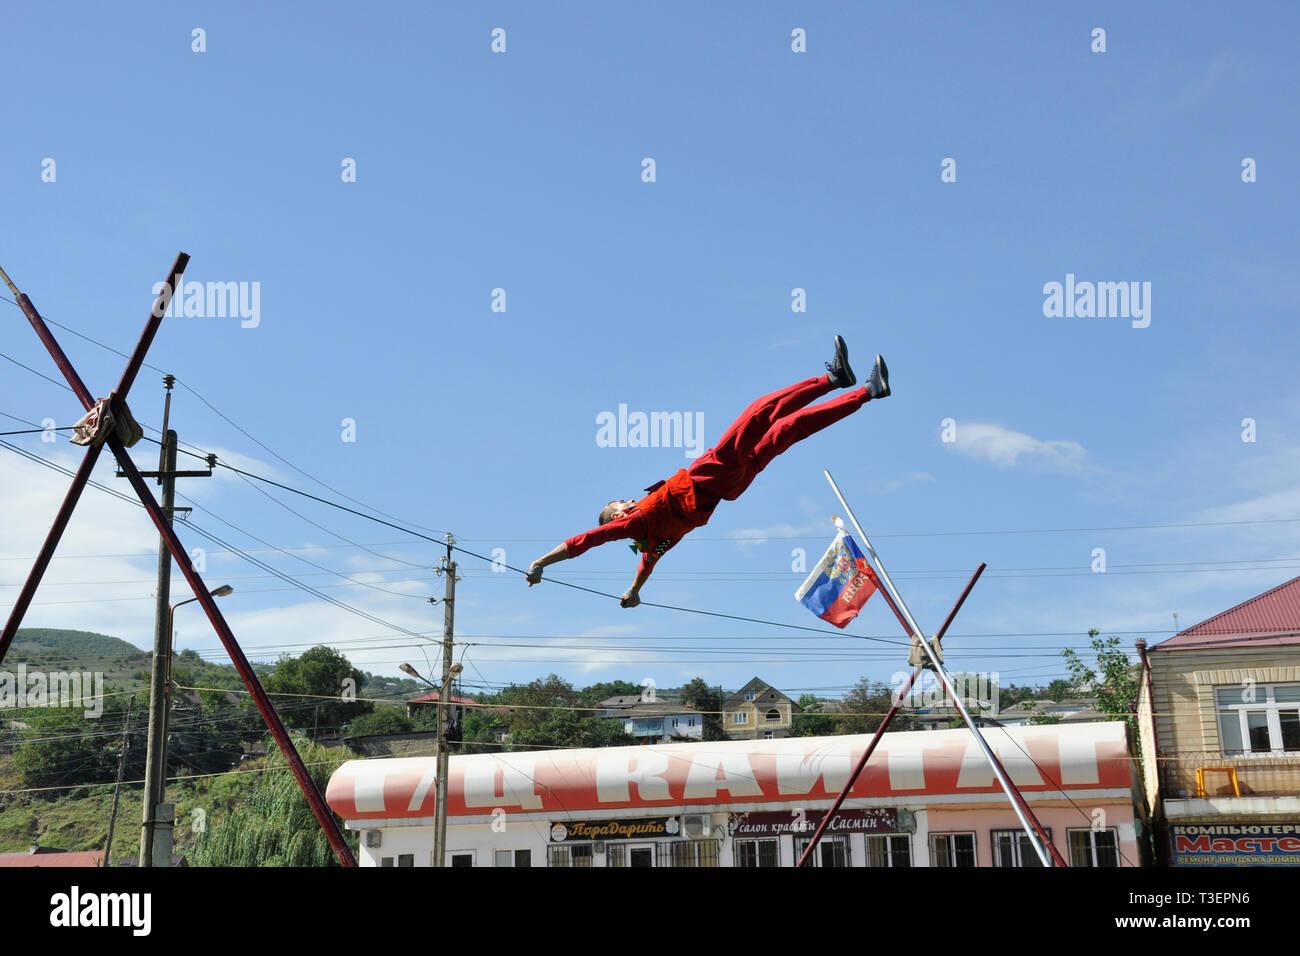 Russia, Dagestan, Majalis, tightrope walker - Stock Image